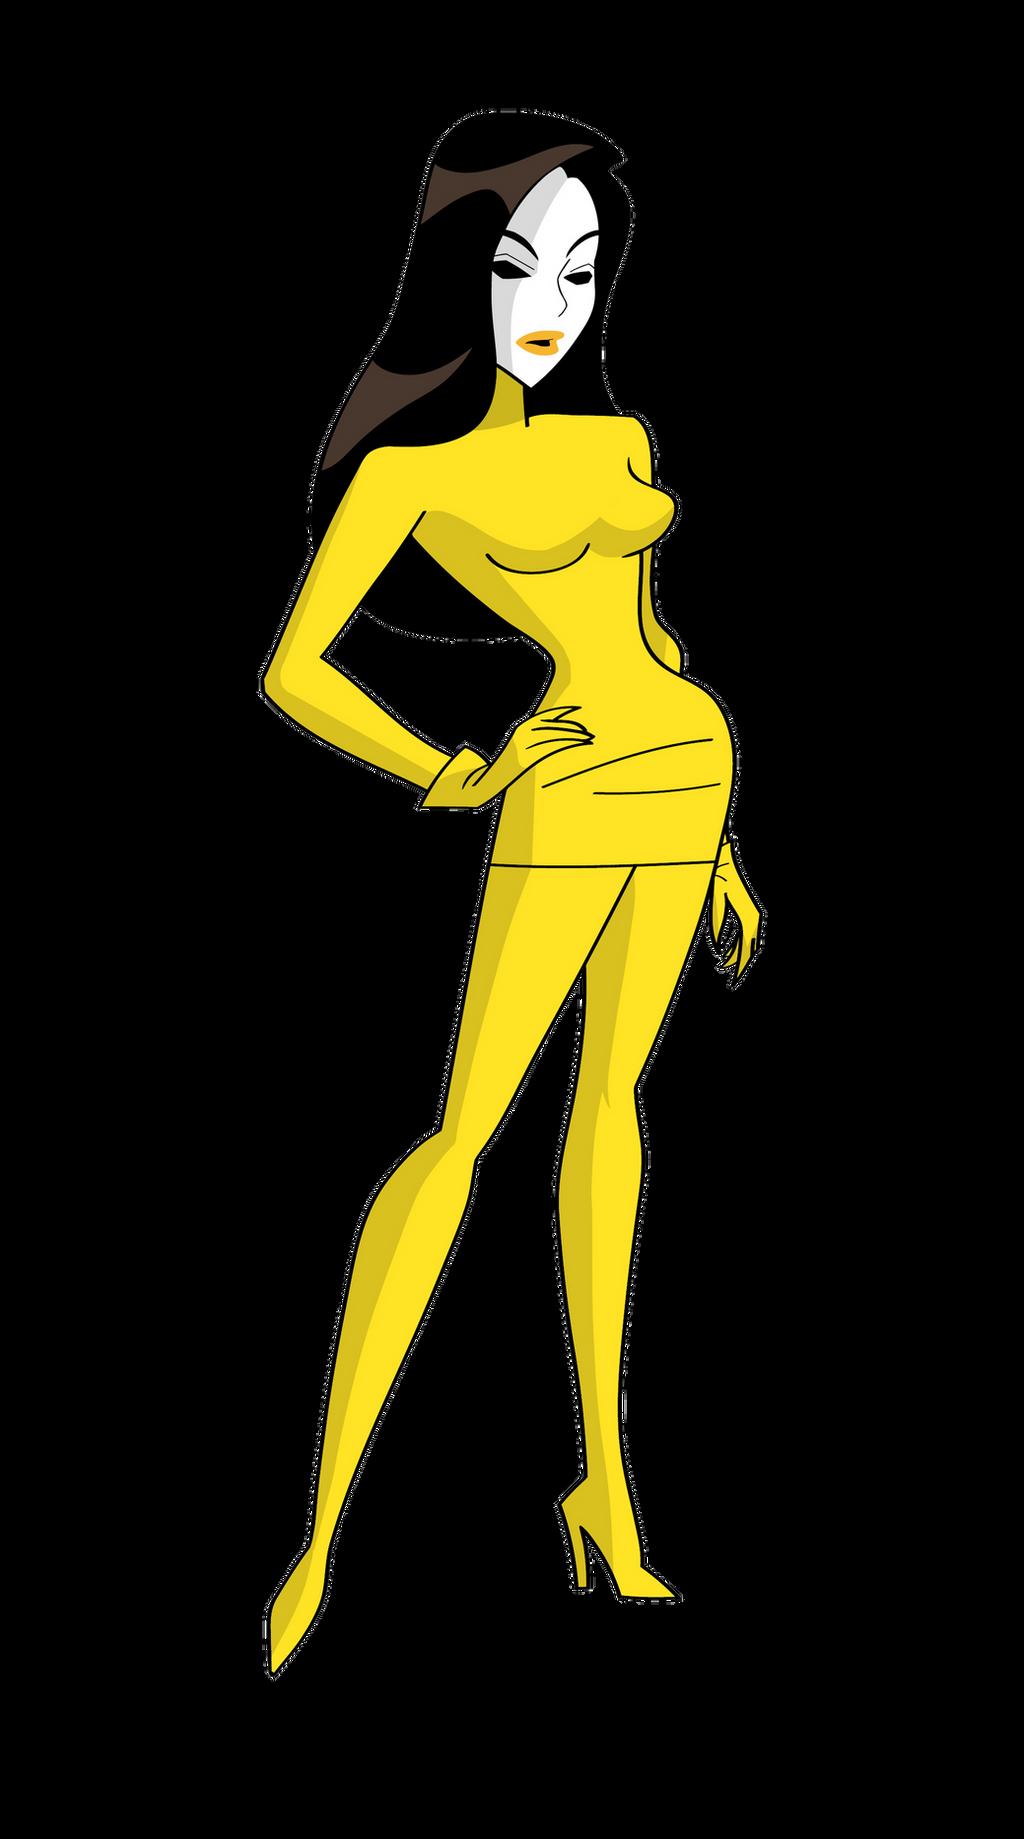 Calendar Girly : Calendar girl by dawidarte on deviantart